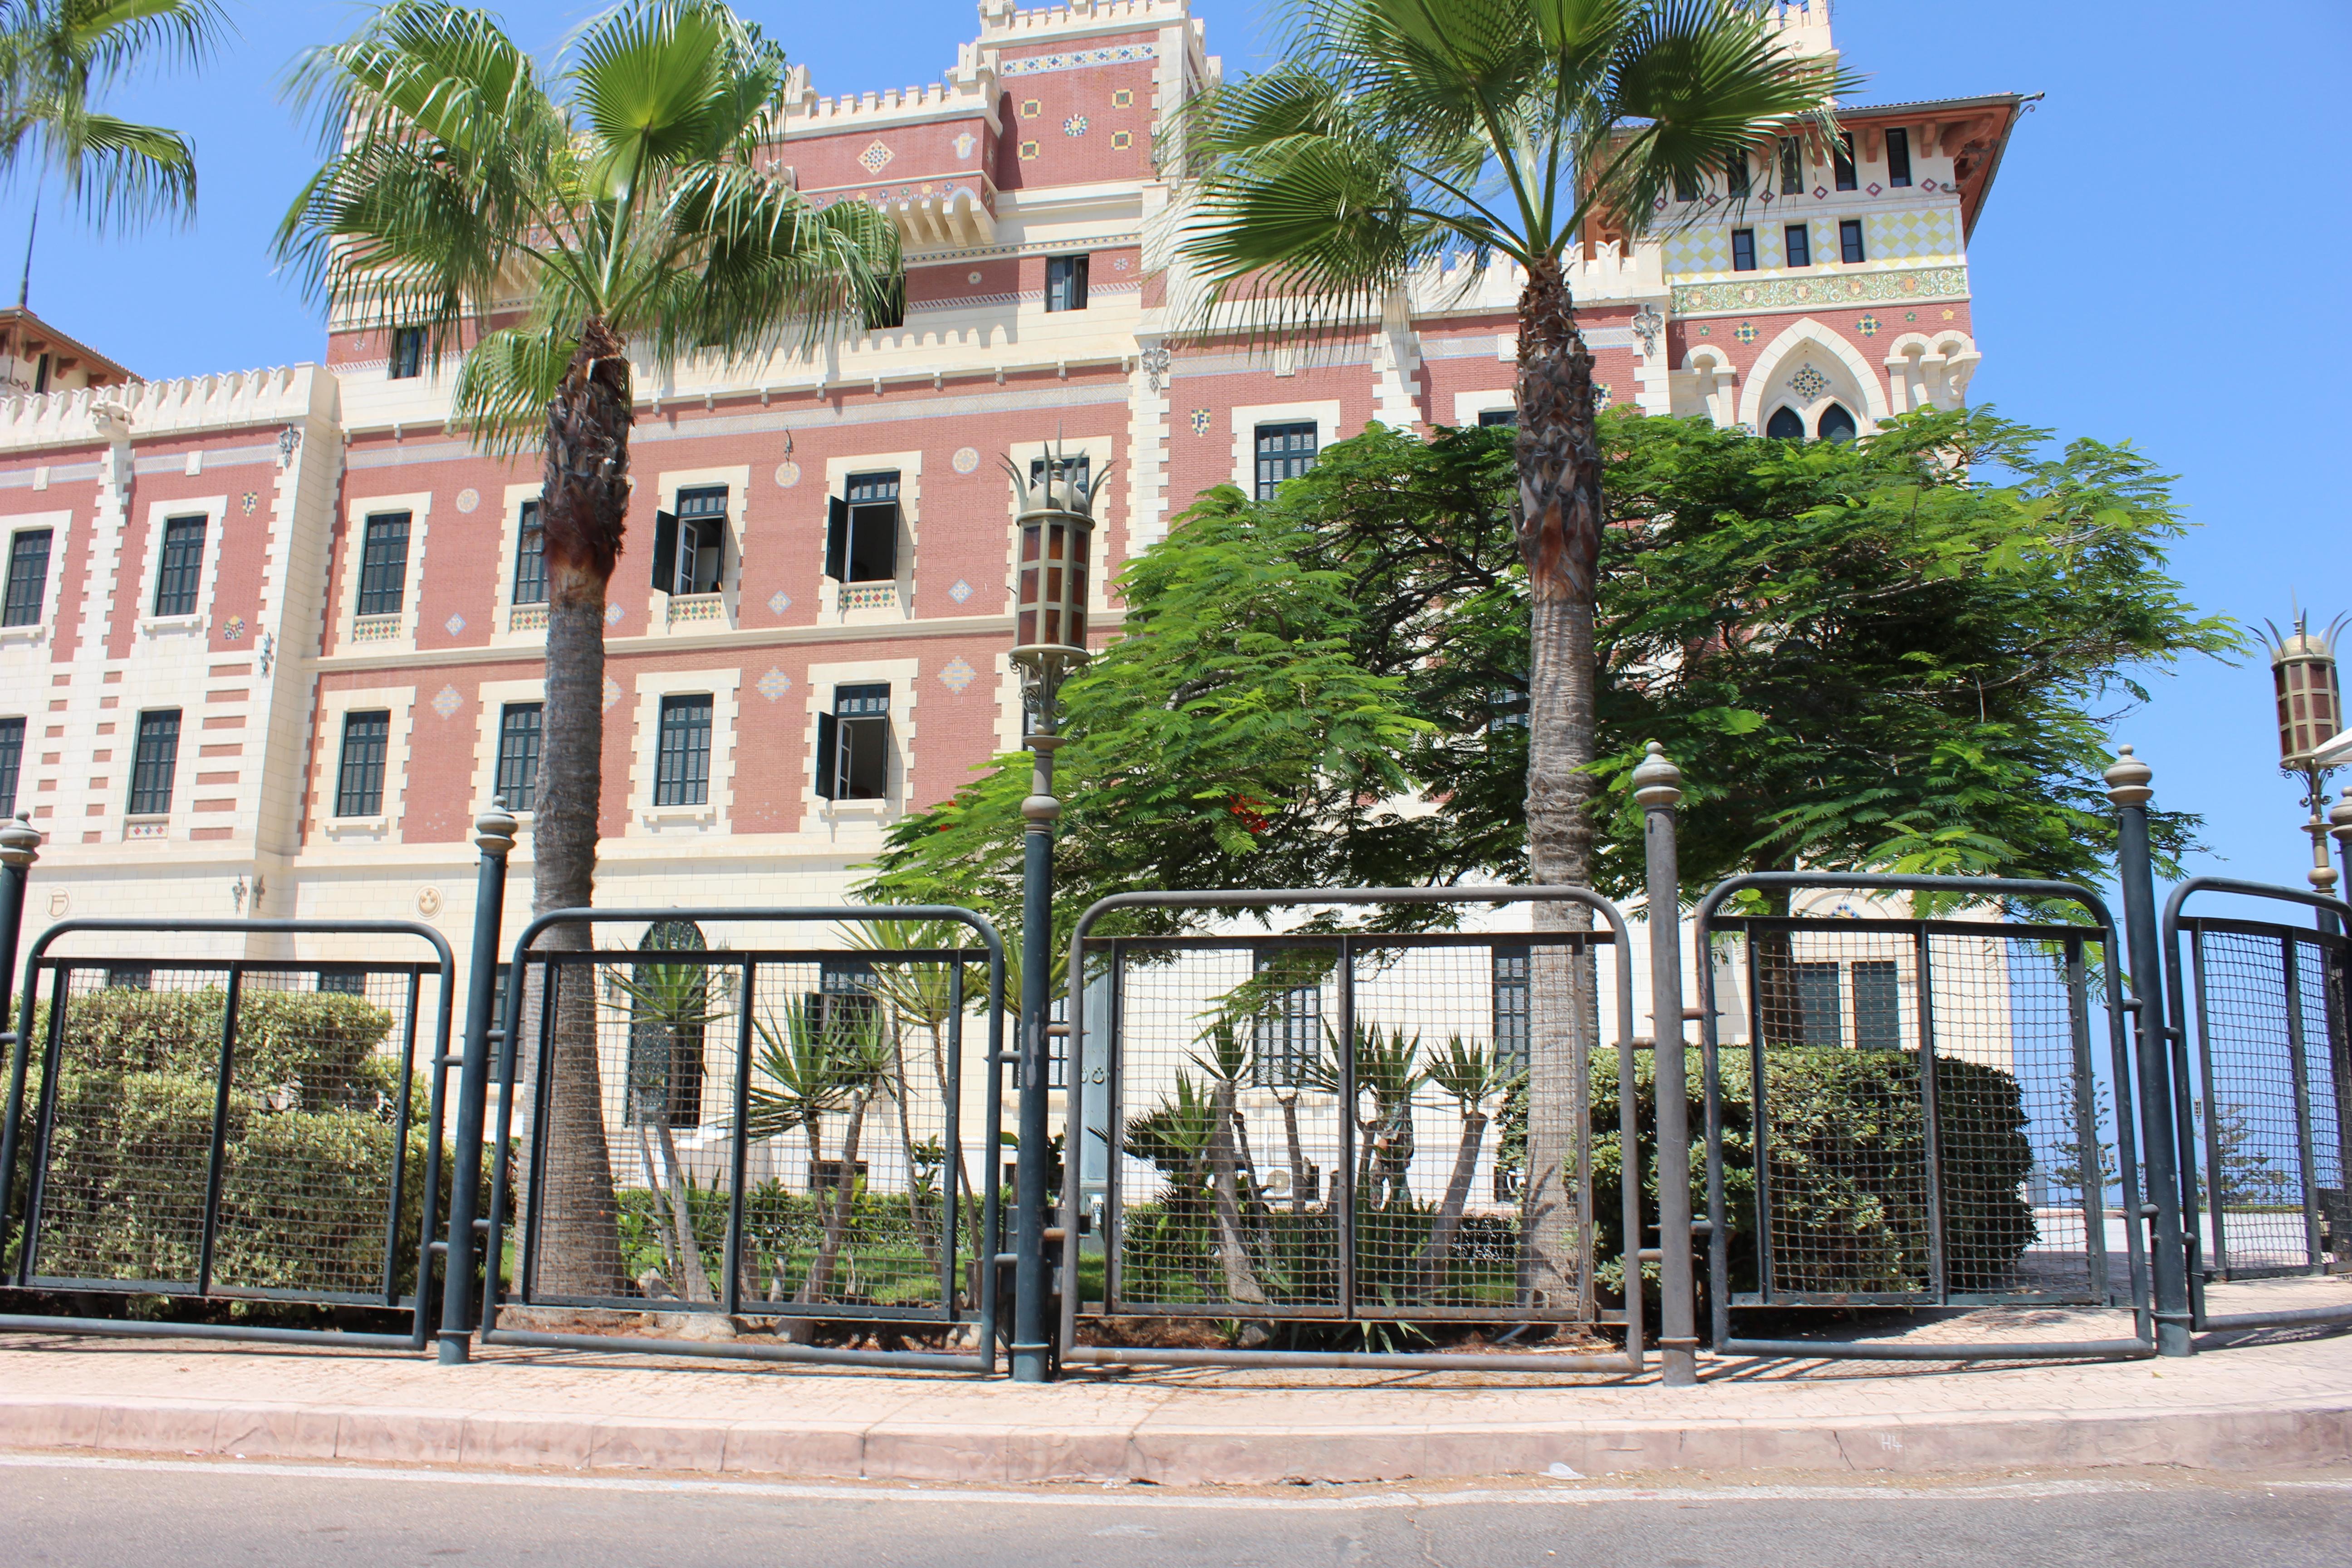 39e5a7791 ملف:Alexandria University 001.JPG - ويكيبيديا، الموسوعة الحرة